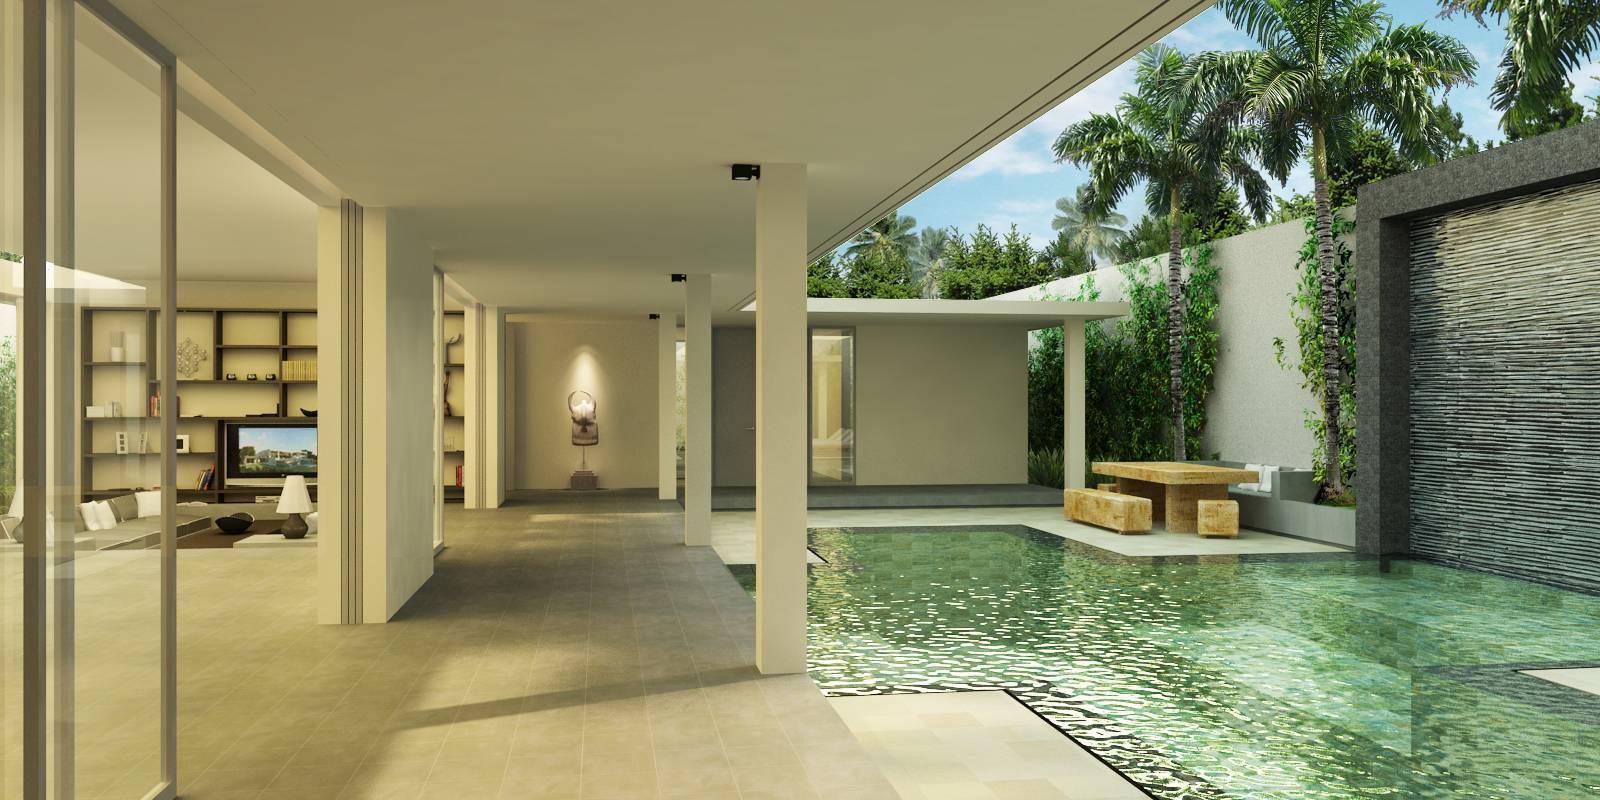 Skylight Architecture Sunyi Villa Bali, Indonesia Bali, Indonesia Swimming-Pool-View-1   7611